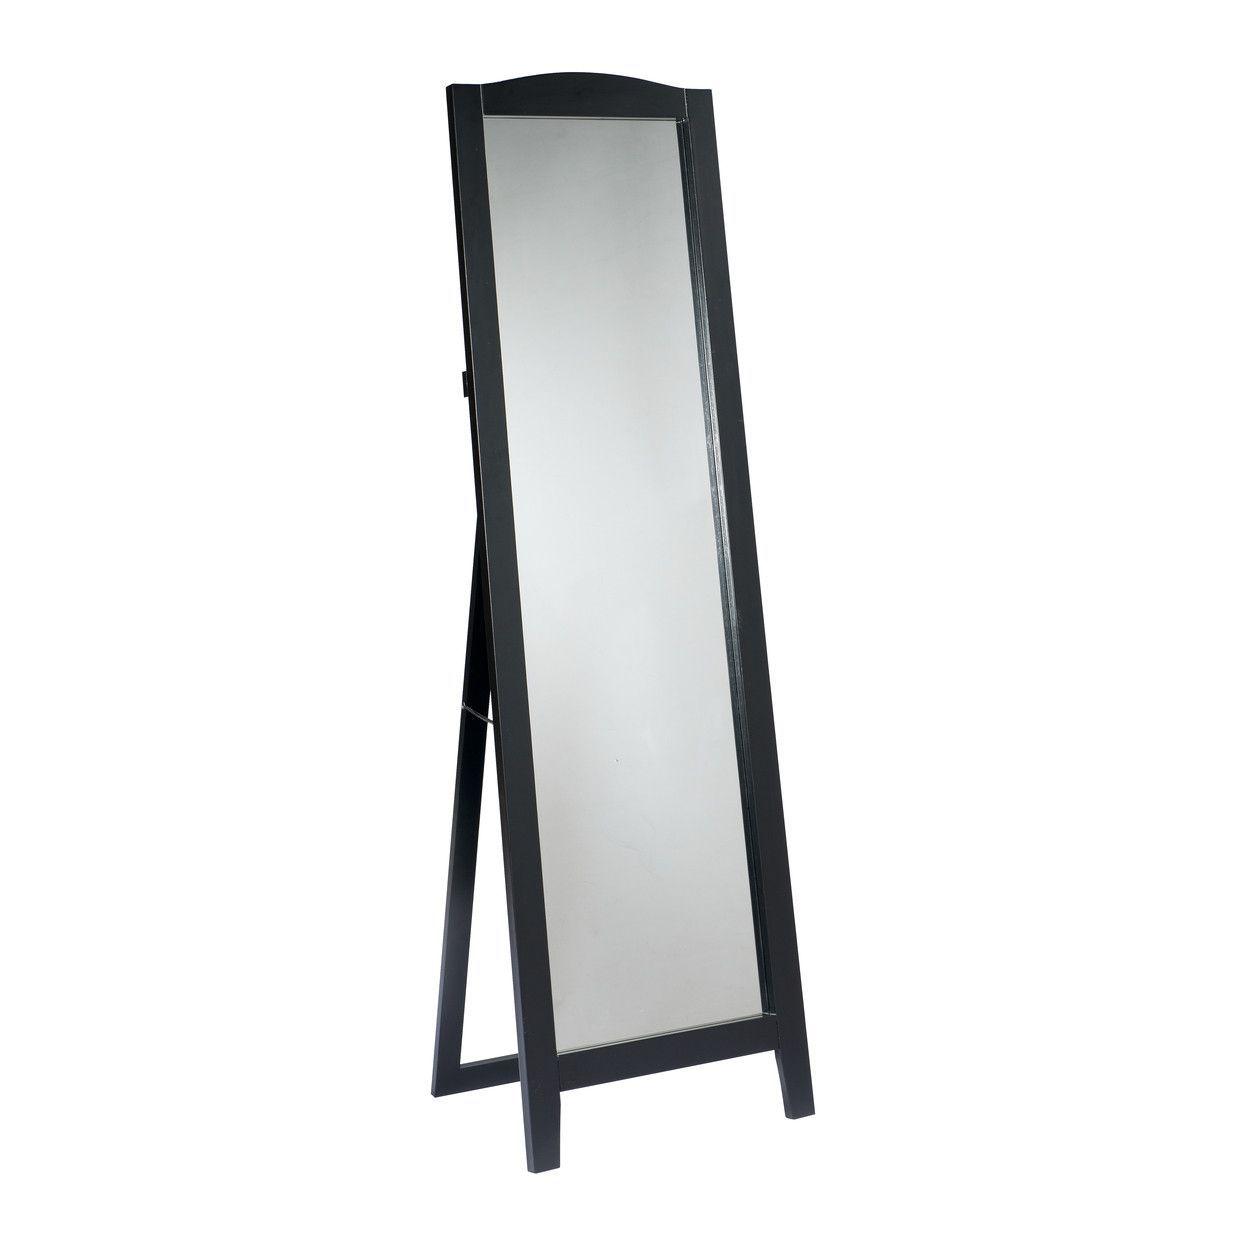 Pilaster Designs - Black Finish Wood Framed Floor Standing Mirror